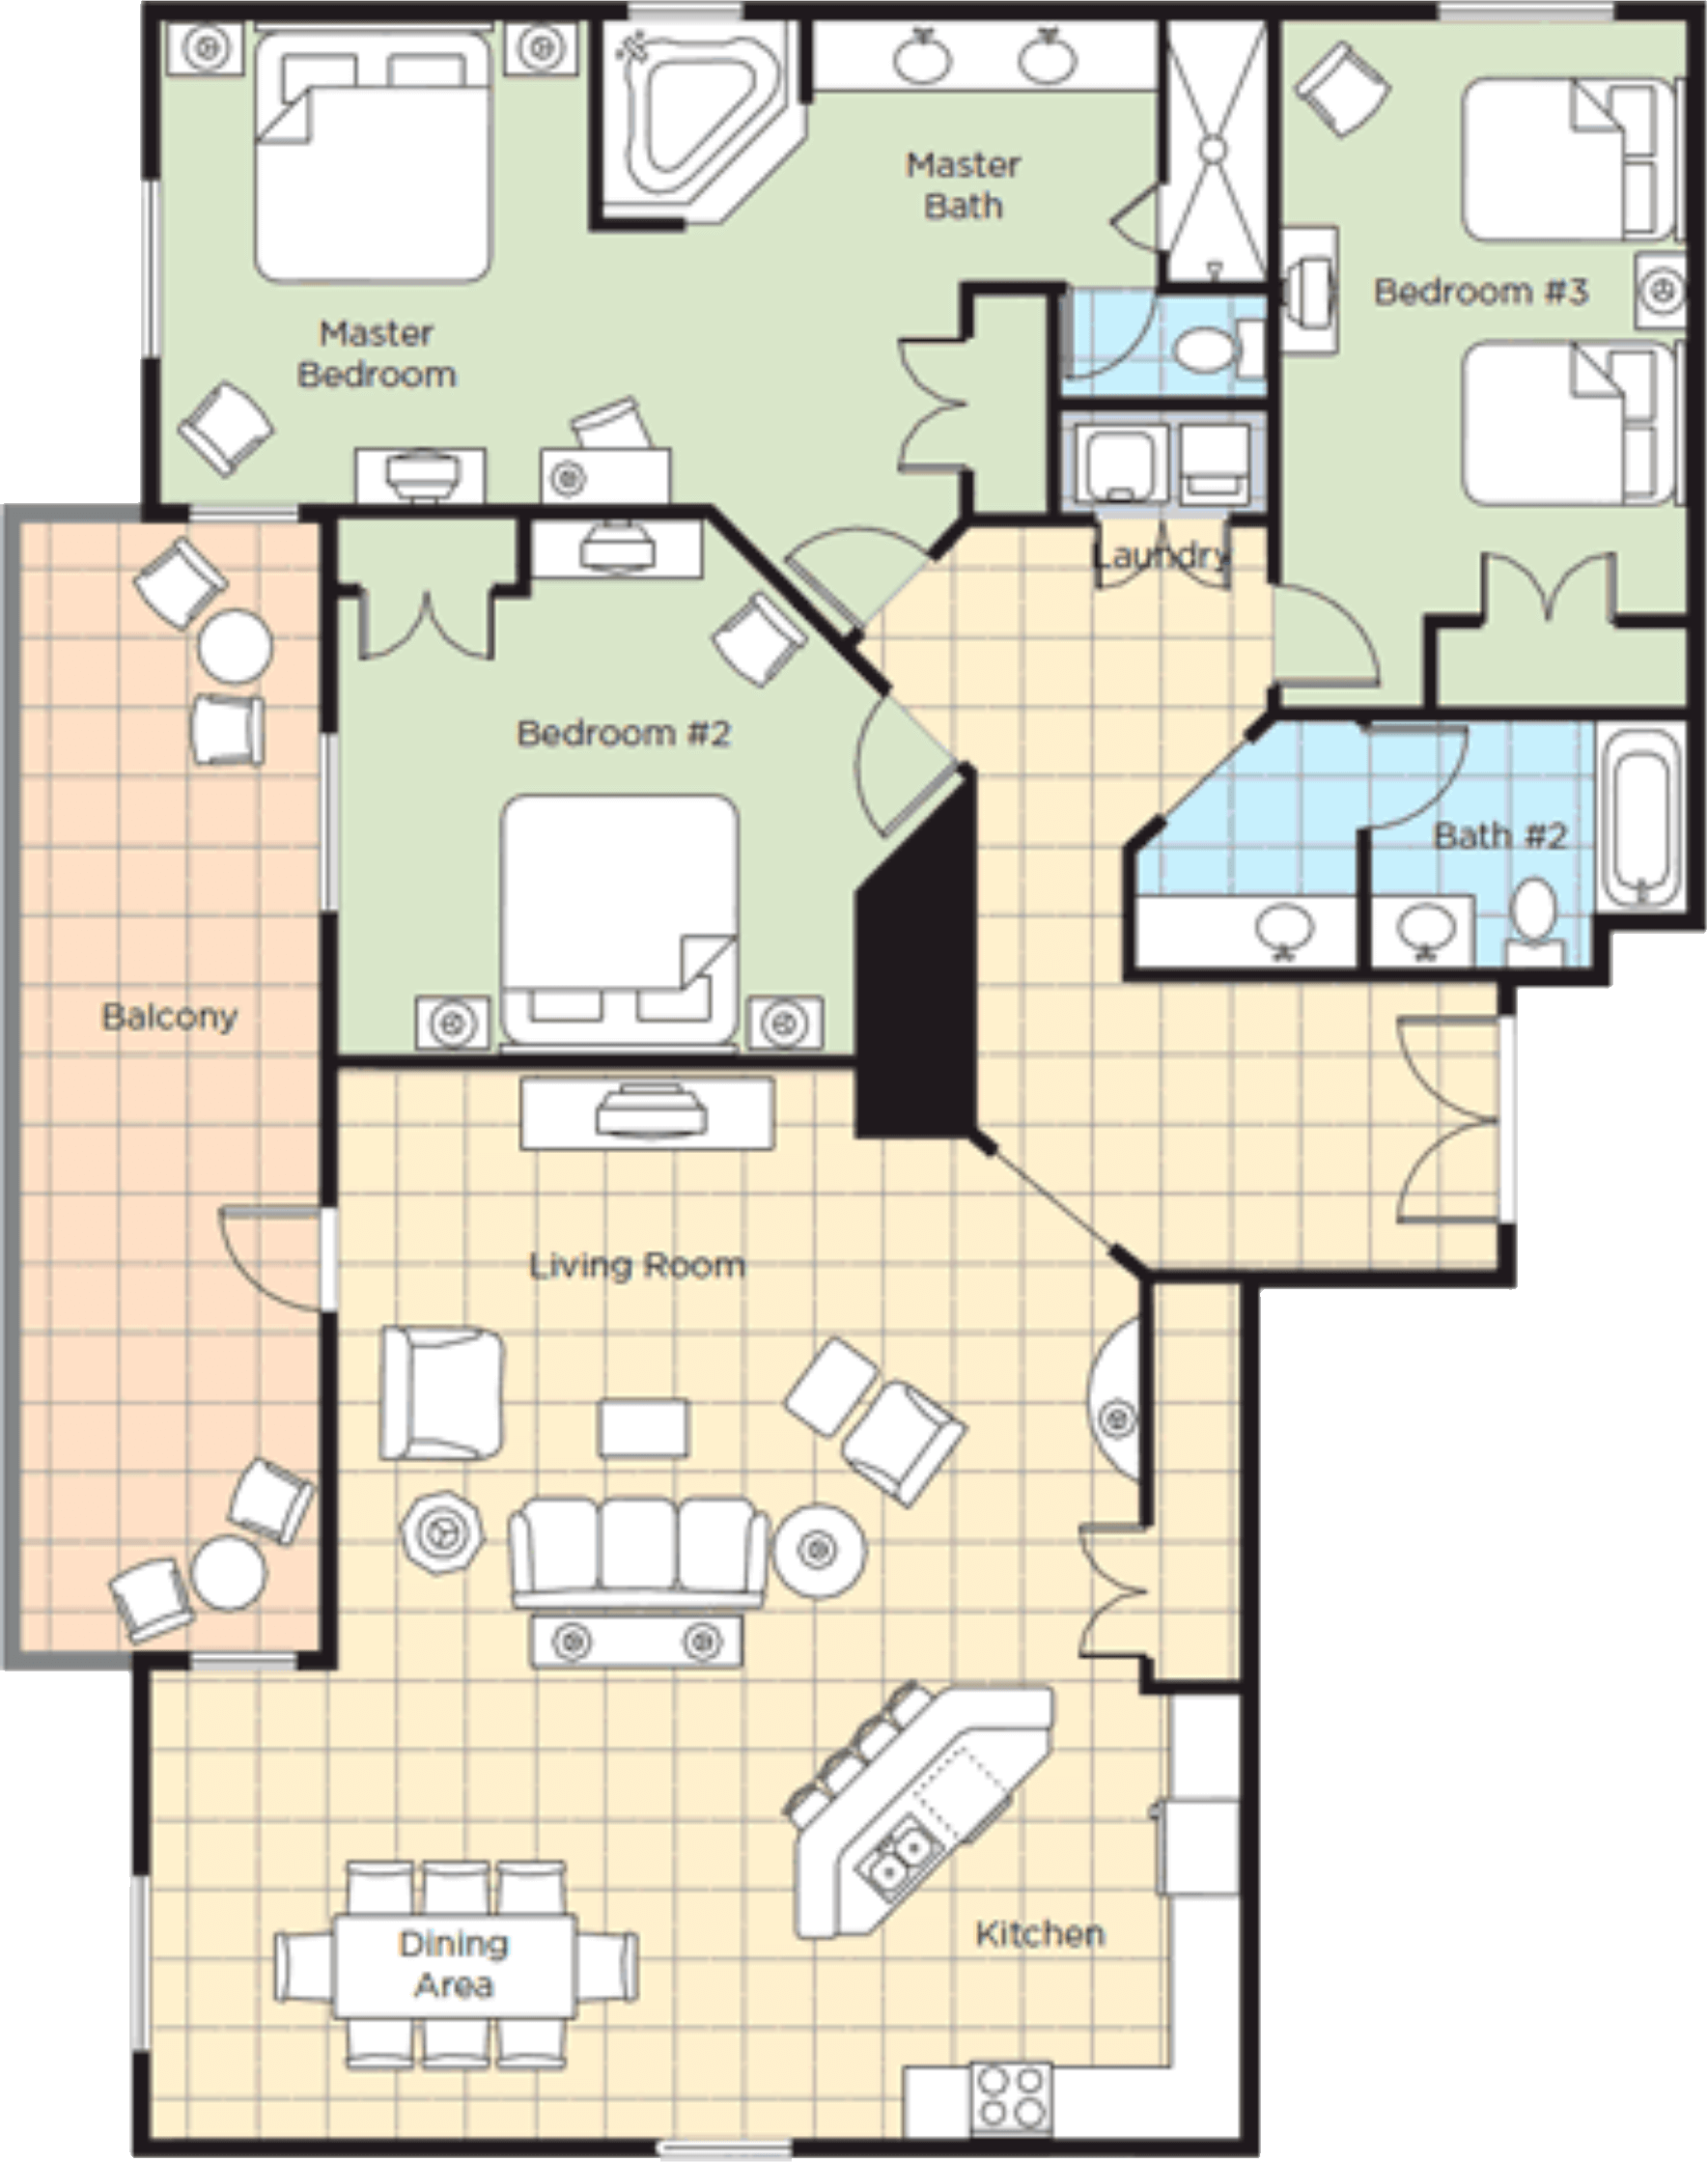 Image of floorplan for Three Bedroom Presidential